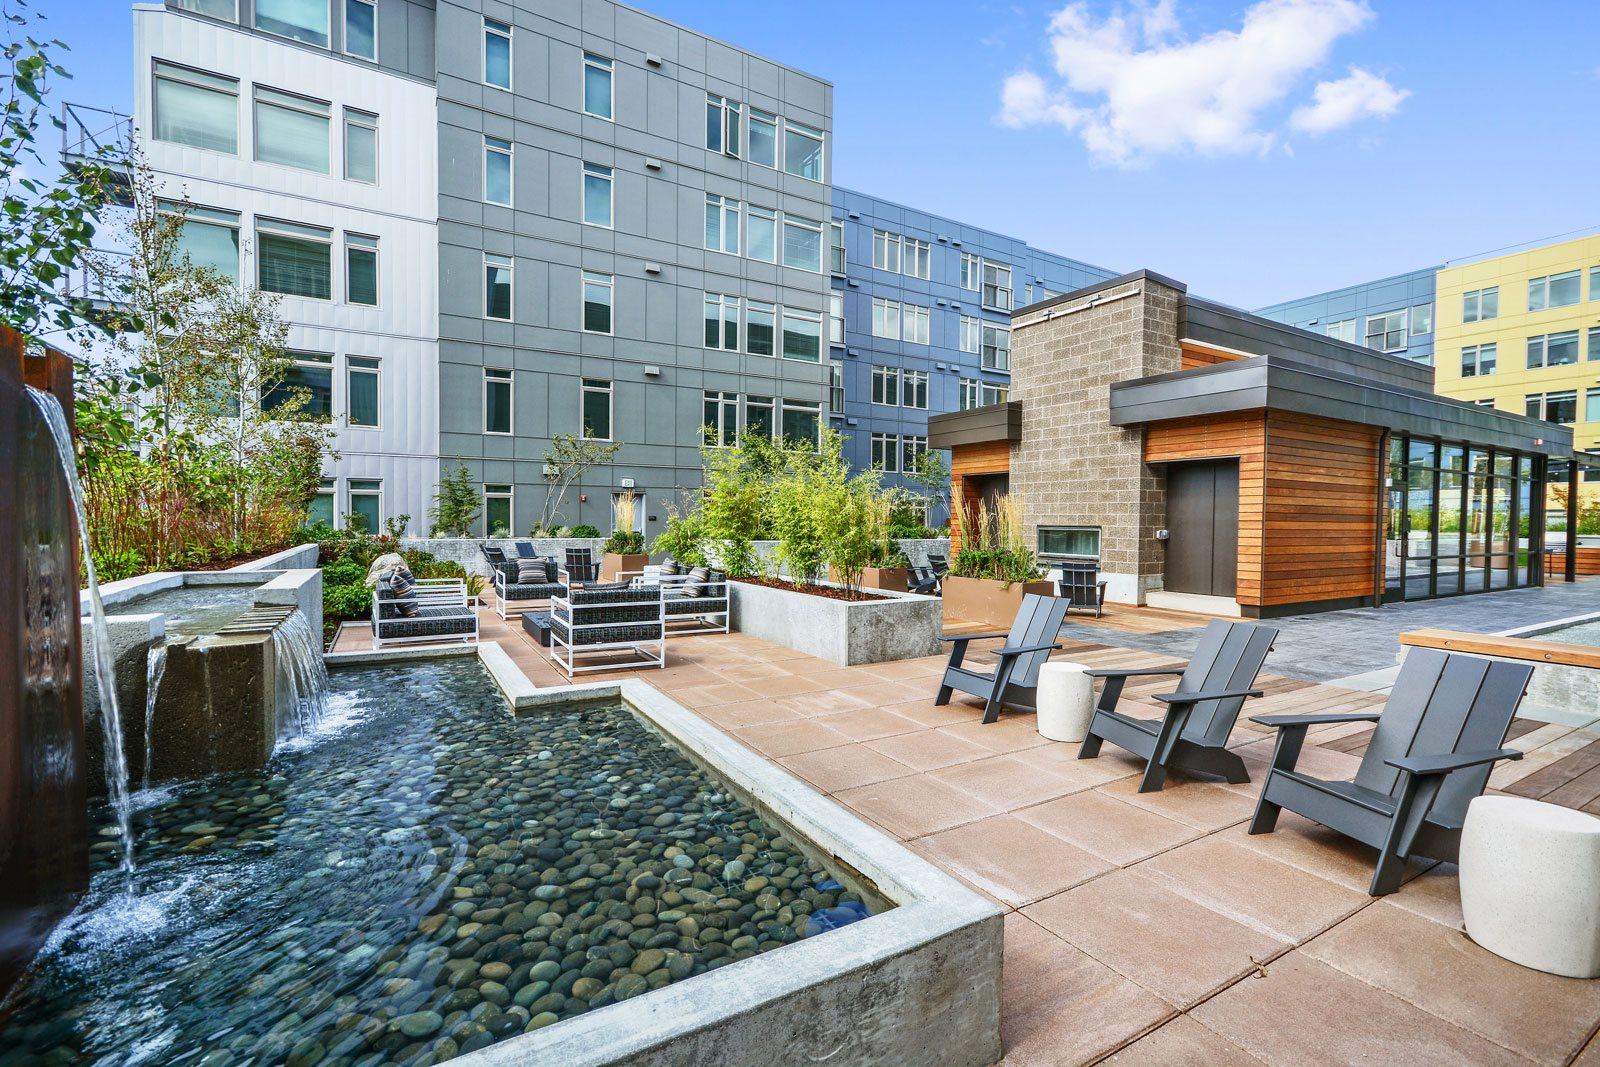 Courtyard Garden at The Whittaker, Seattle, Washington